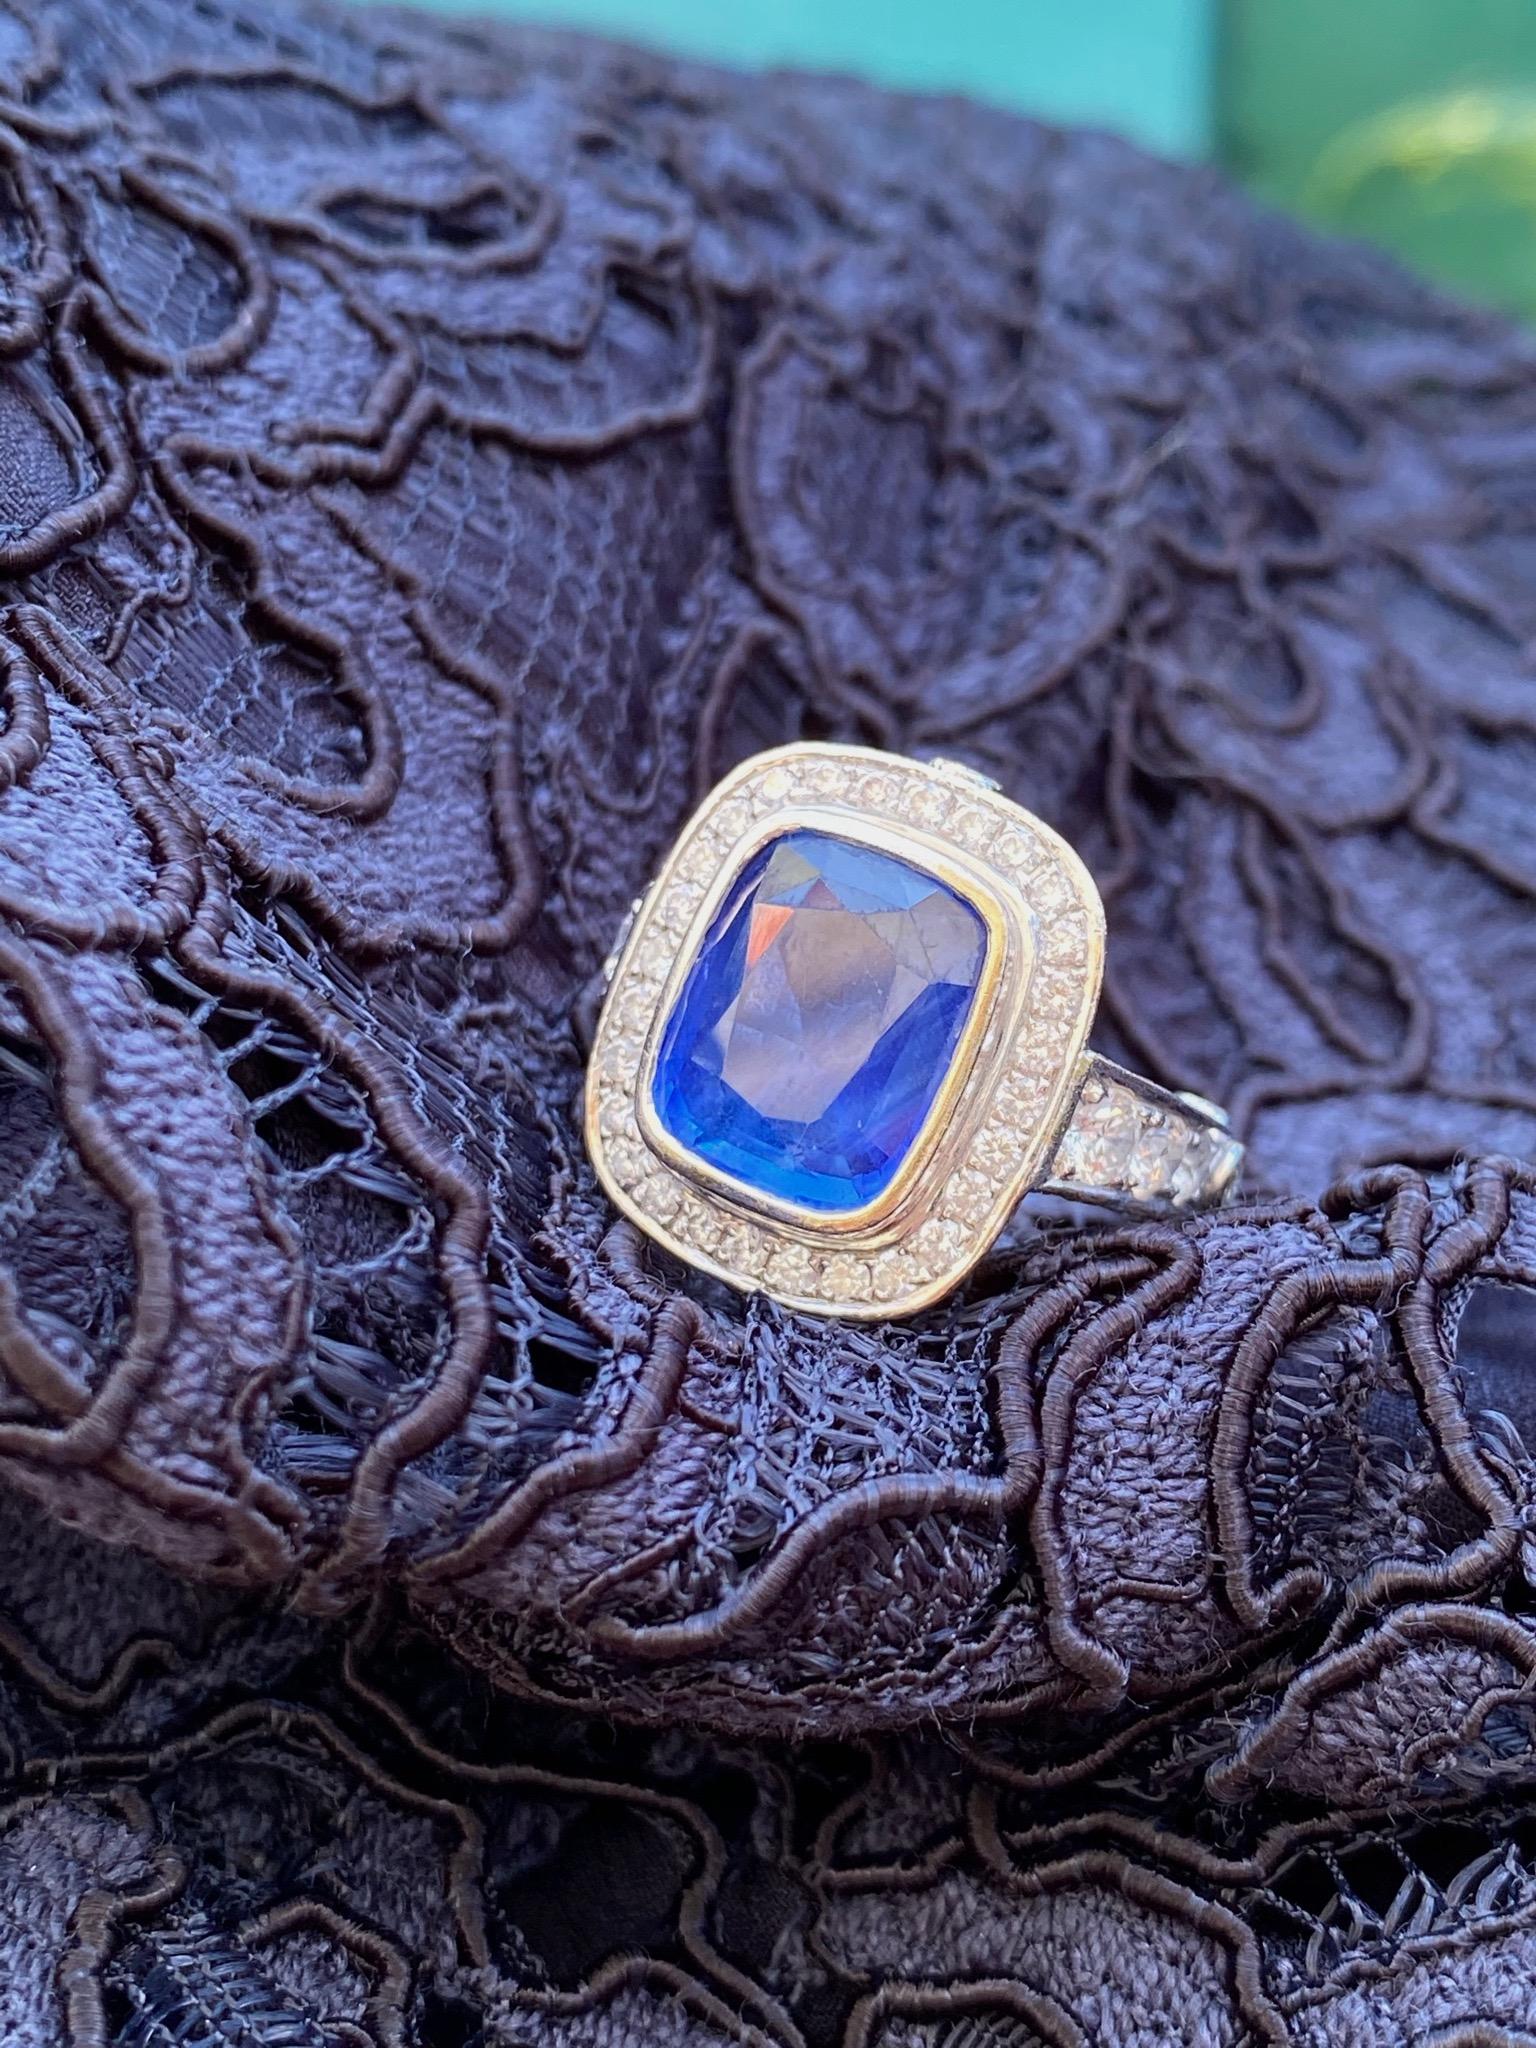 5.5 carat blue sapphire set with diamonds